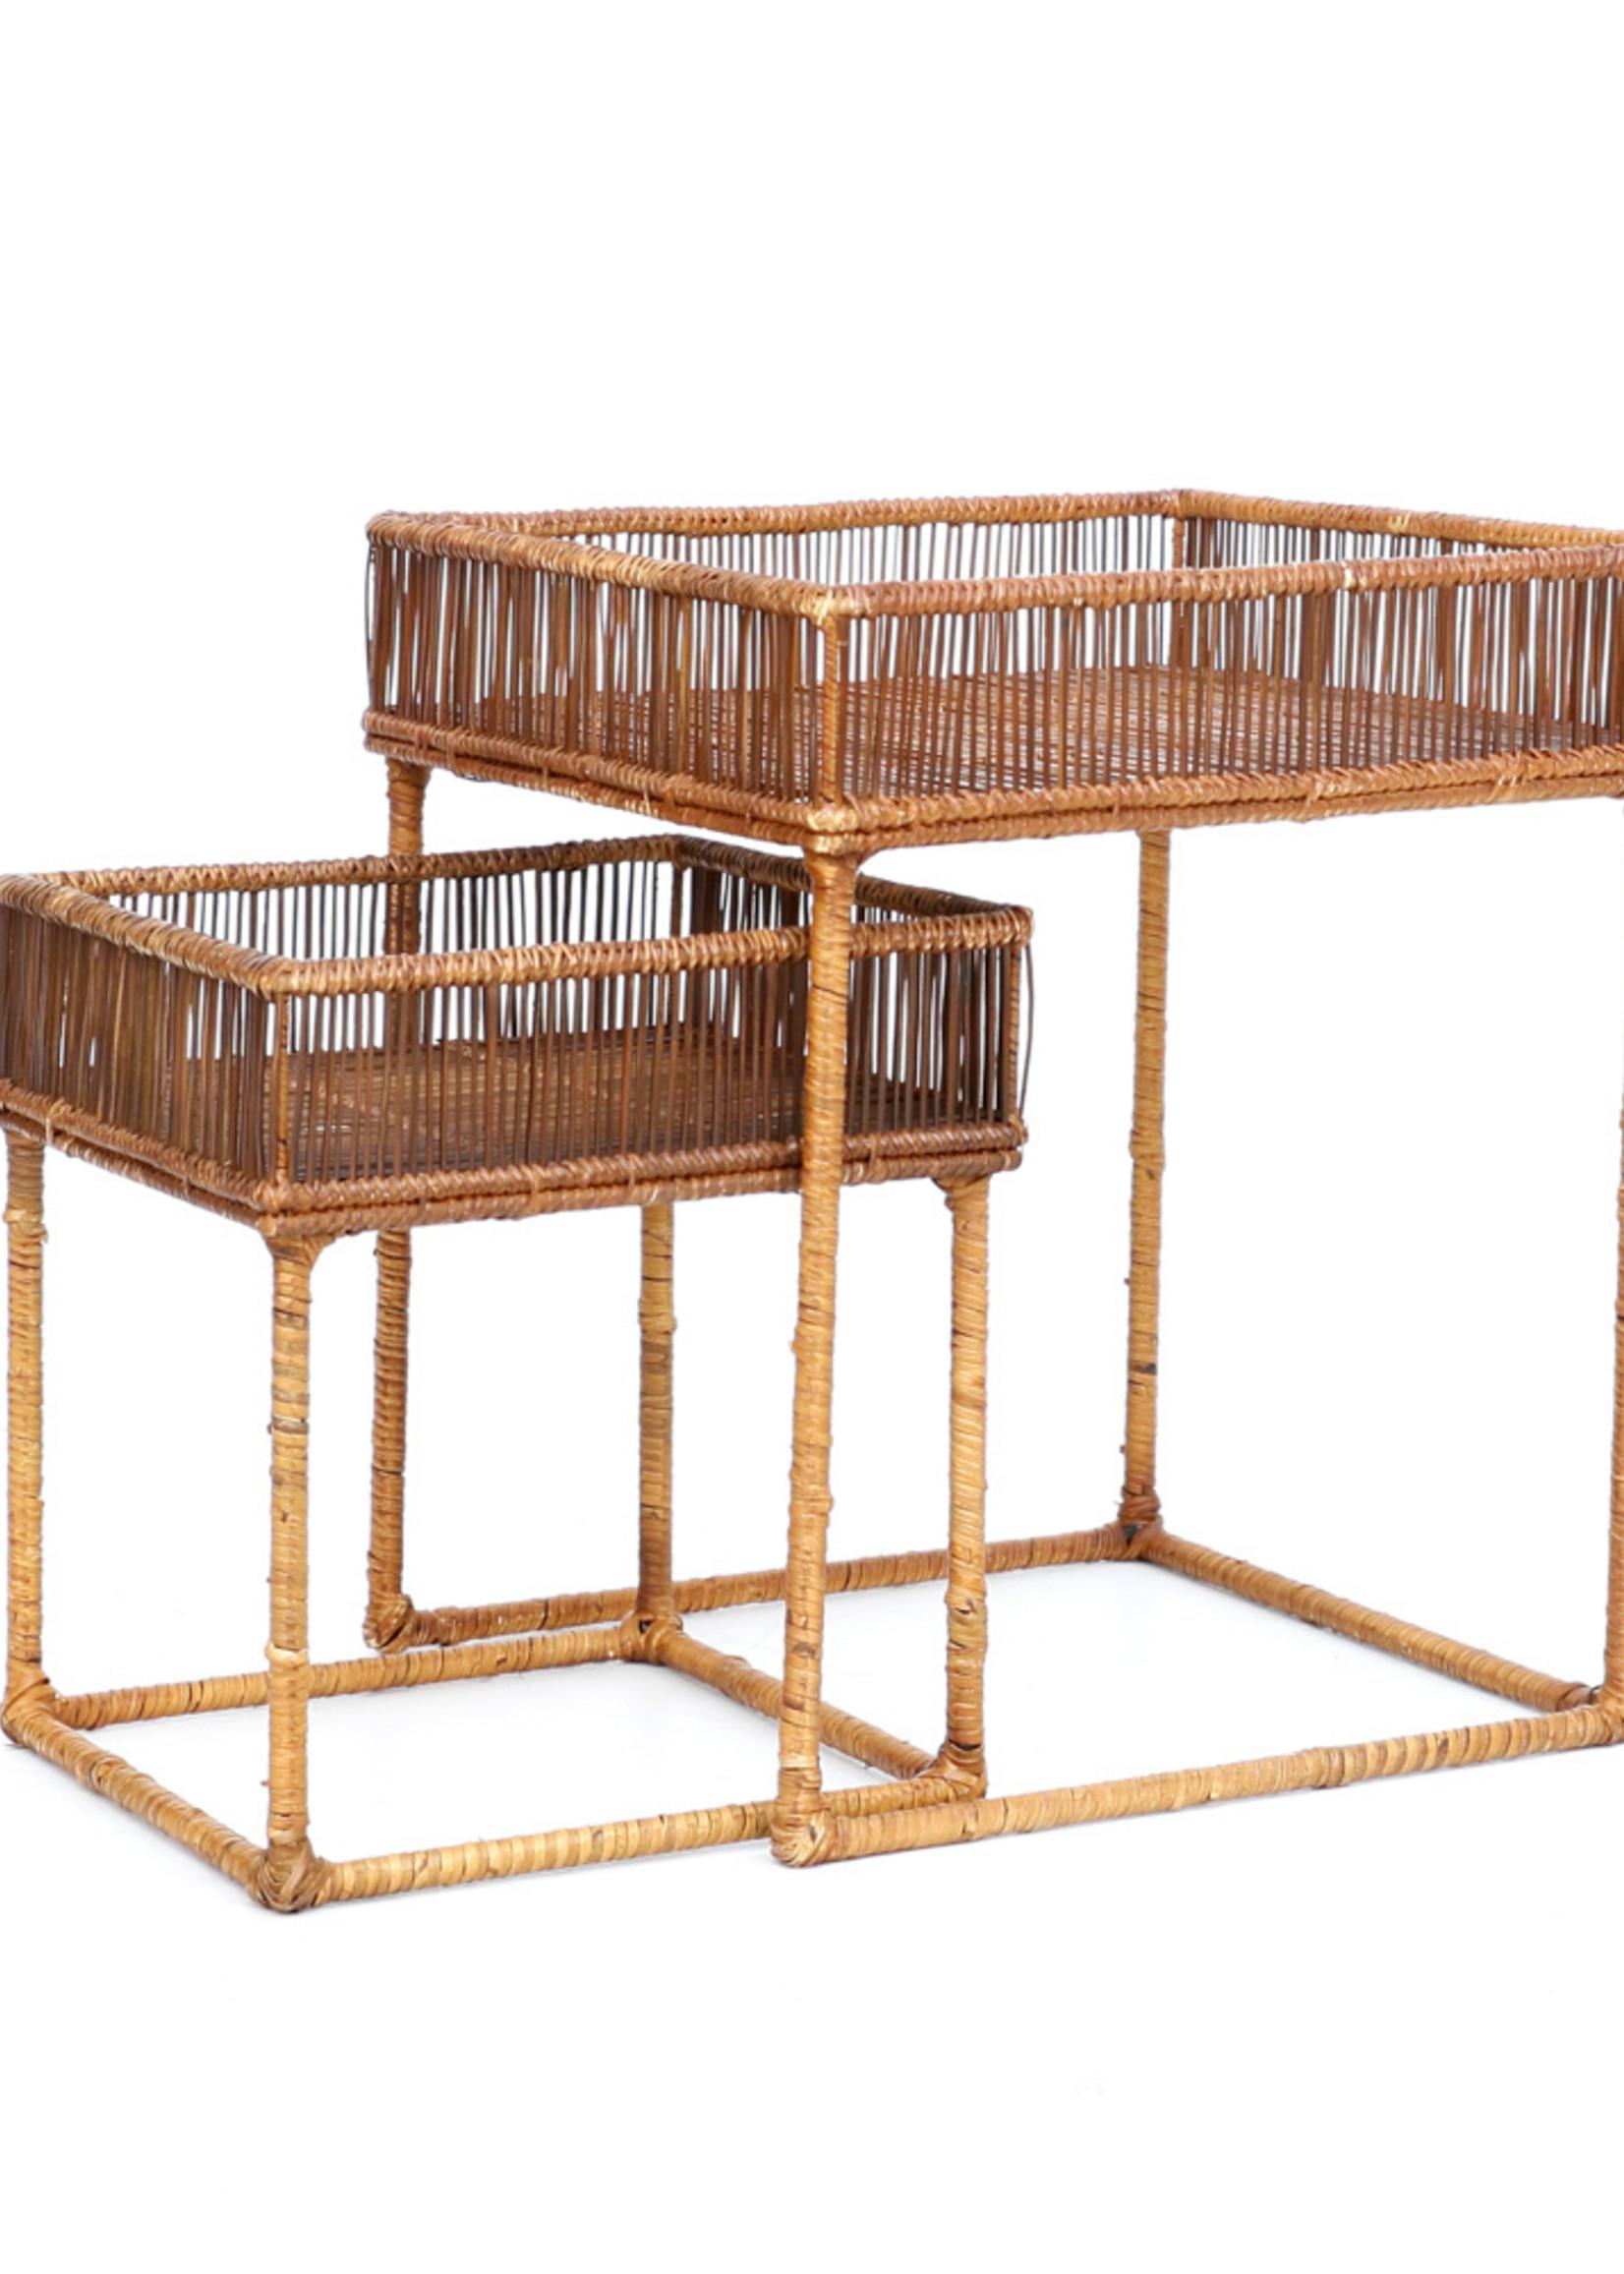 The Lombok Lodge Side Tables - Square - Natural - SET2